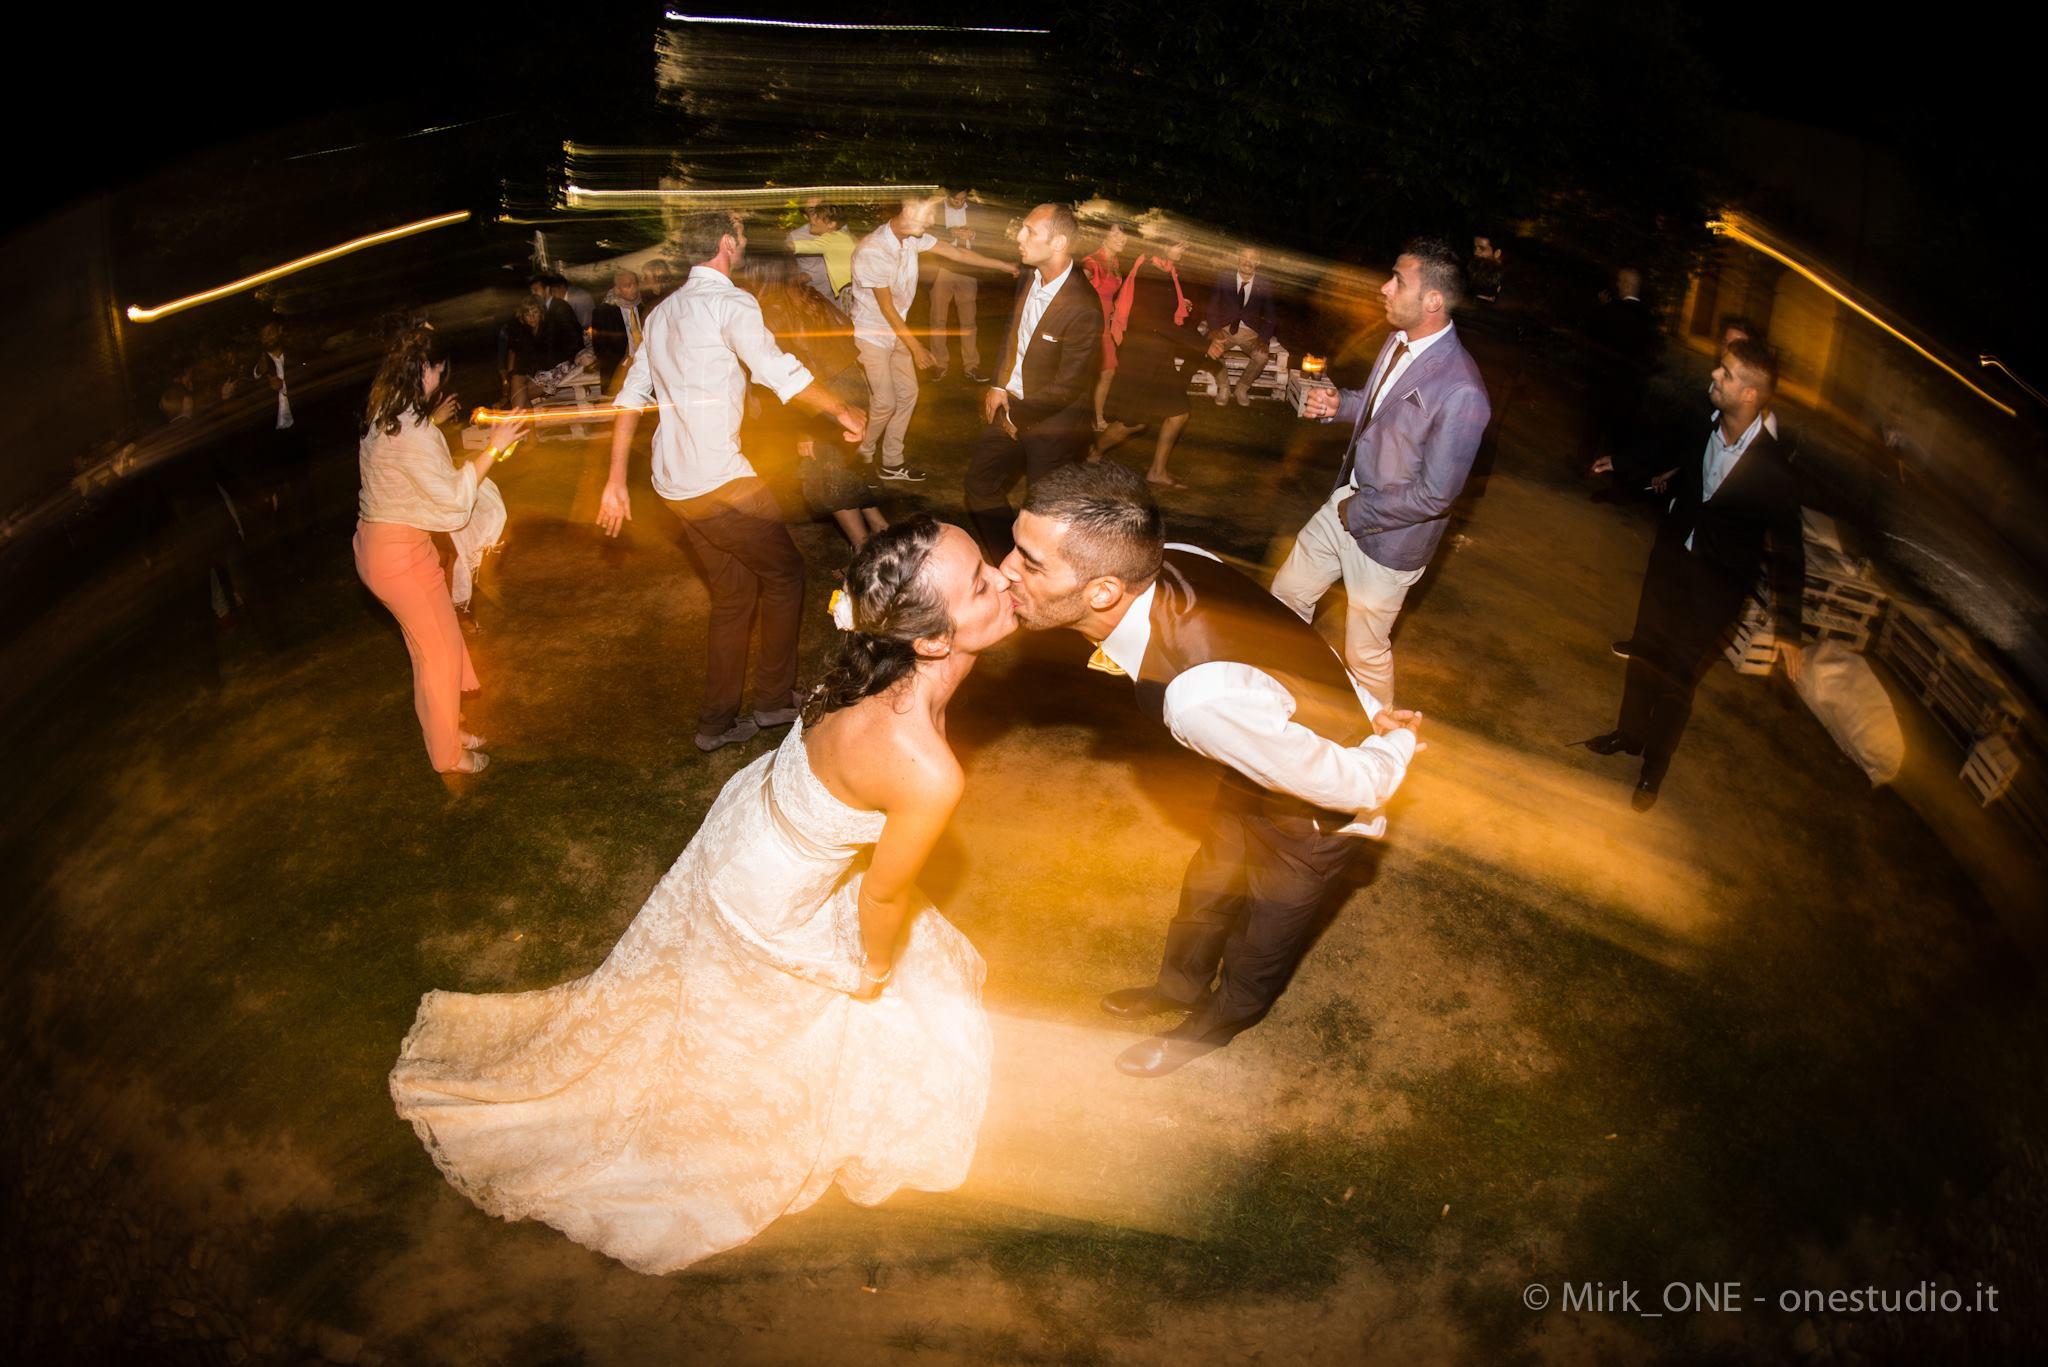 https://lnx.mirkone.it/wp-content/uploads/2018/03/mirk_ONE-fotografo-matrimonio-00890.jpg